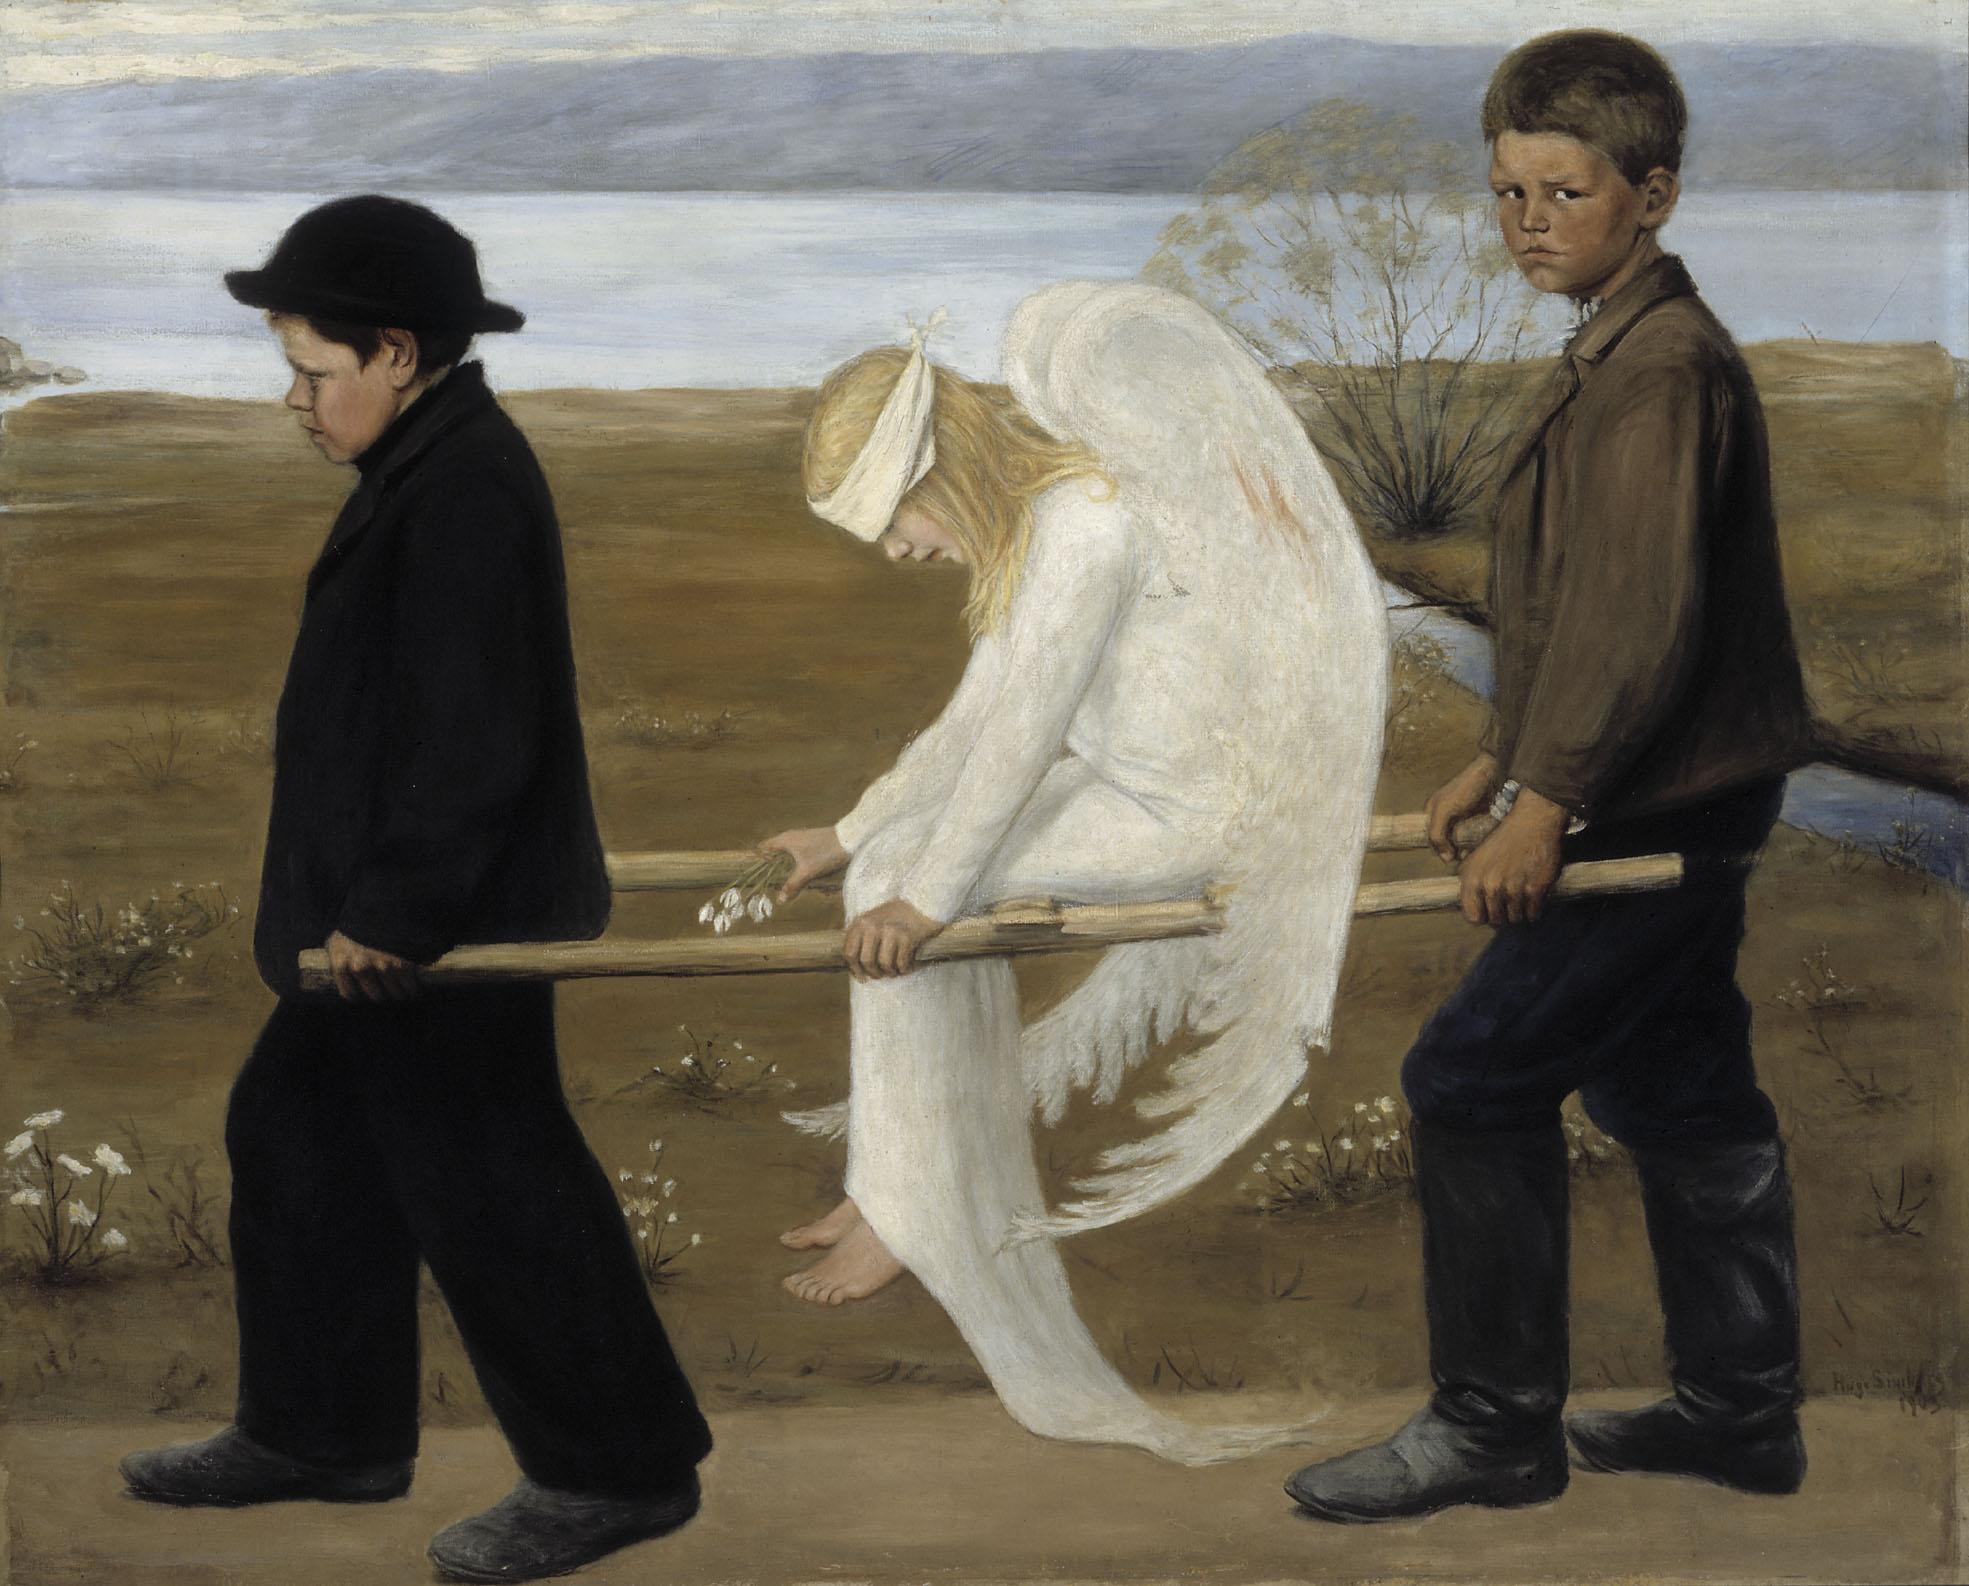 Hugo Simberg - L'angelo ferito, 1905-06